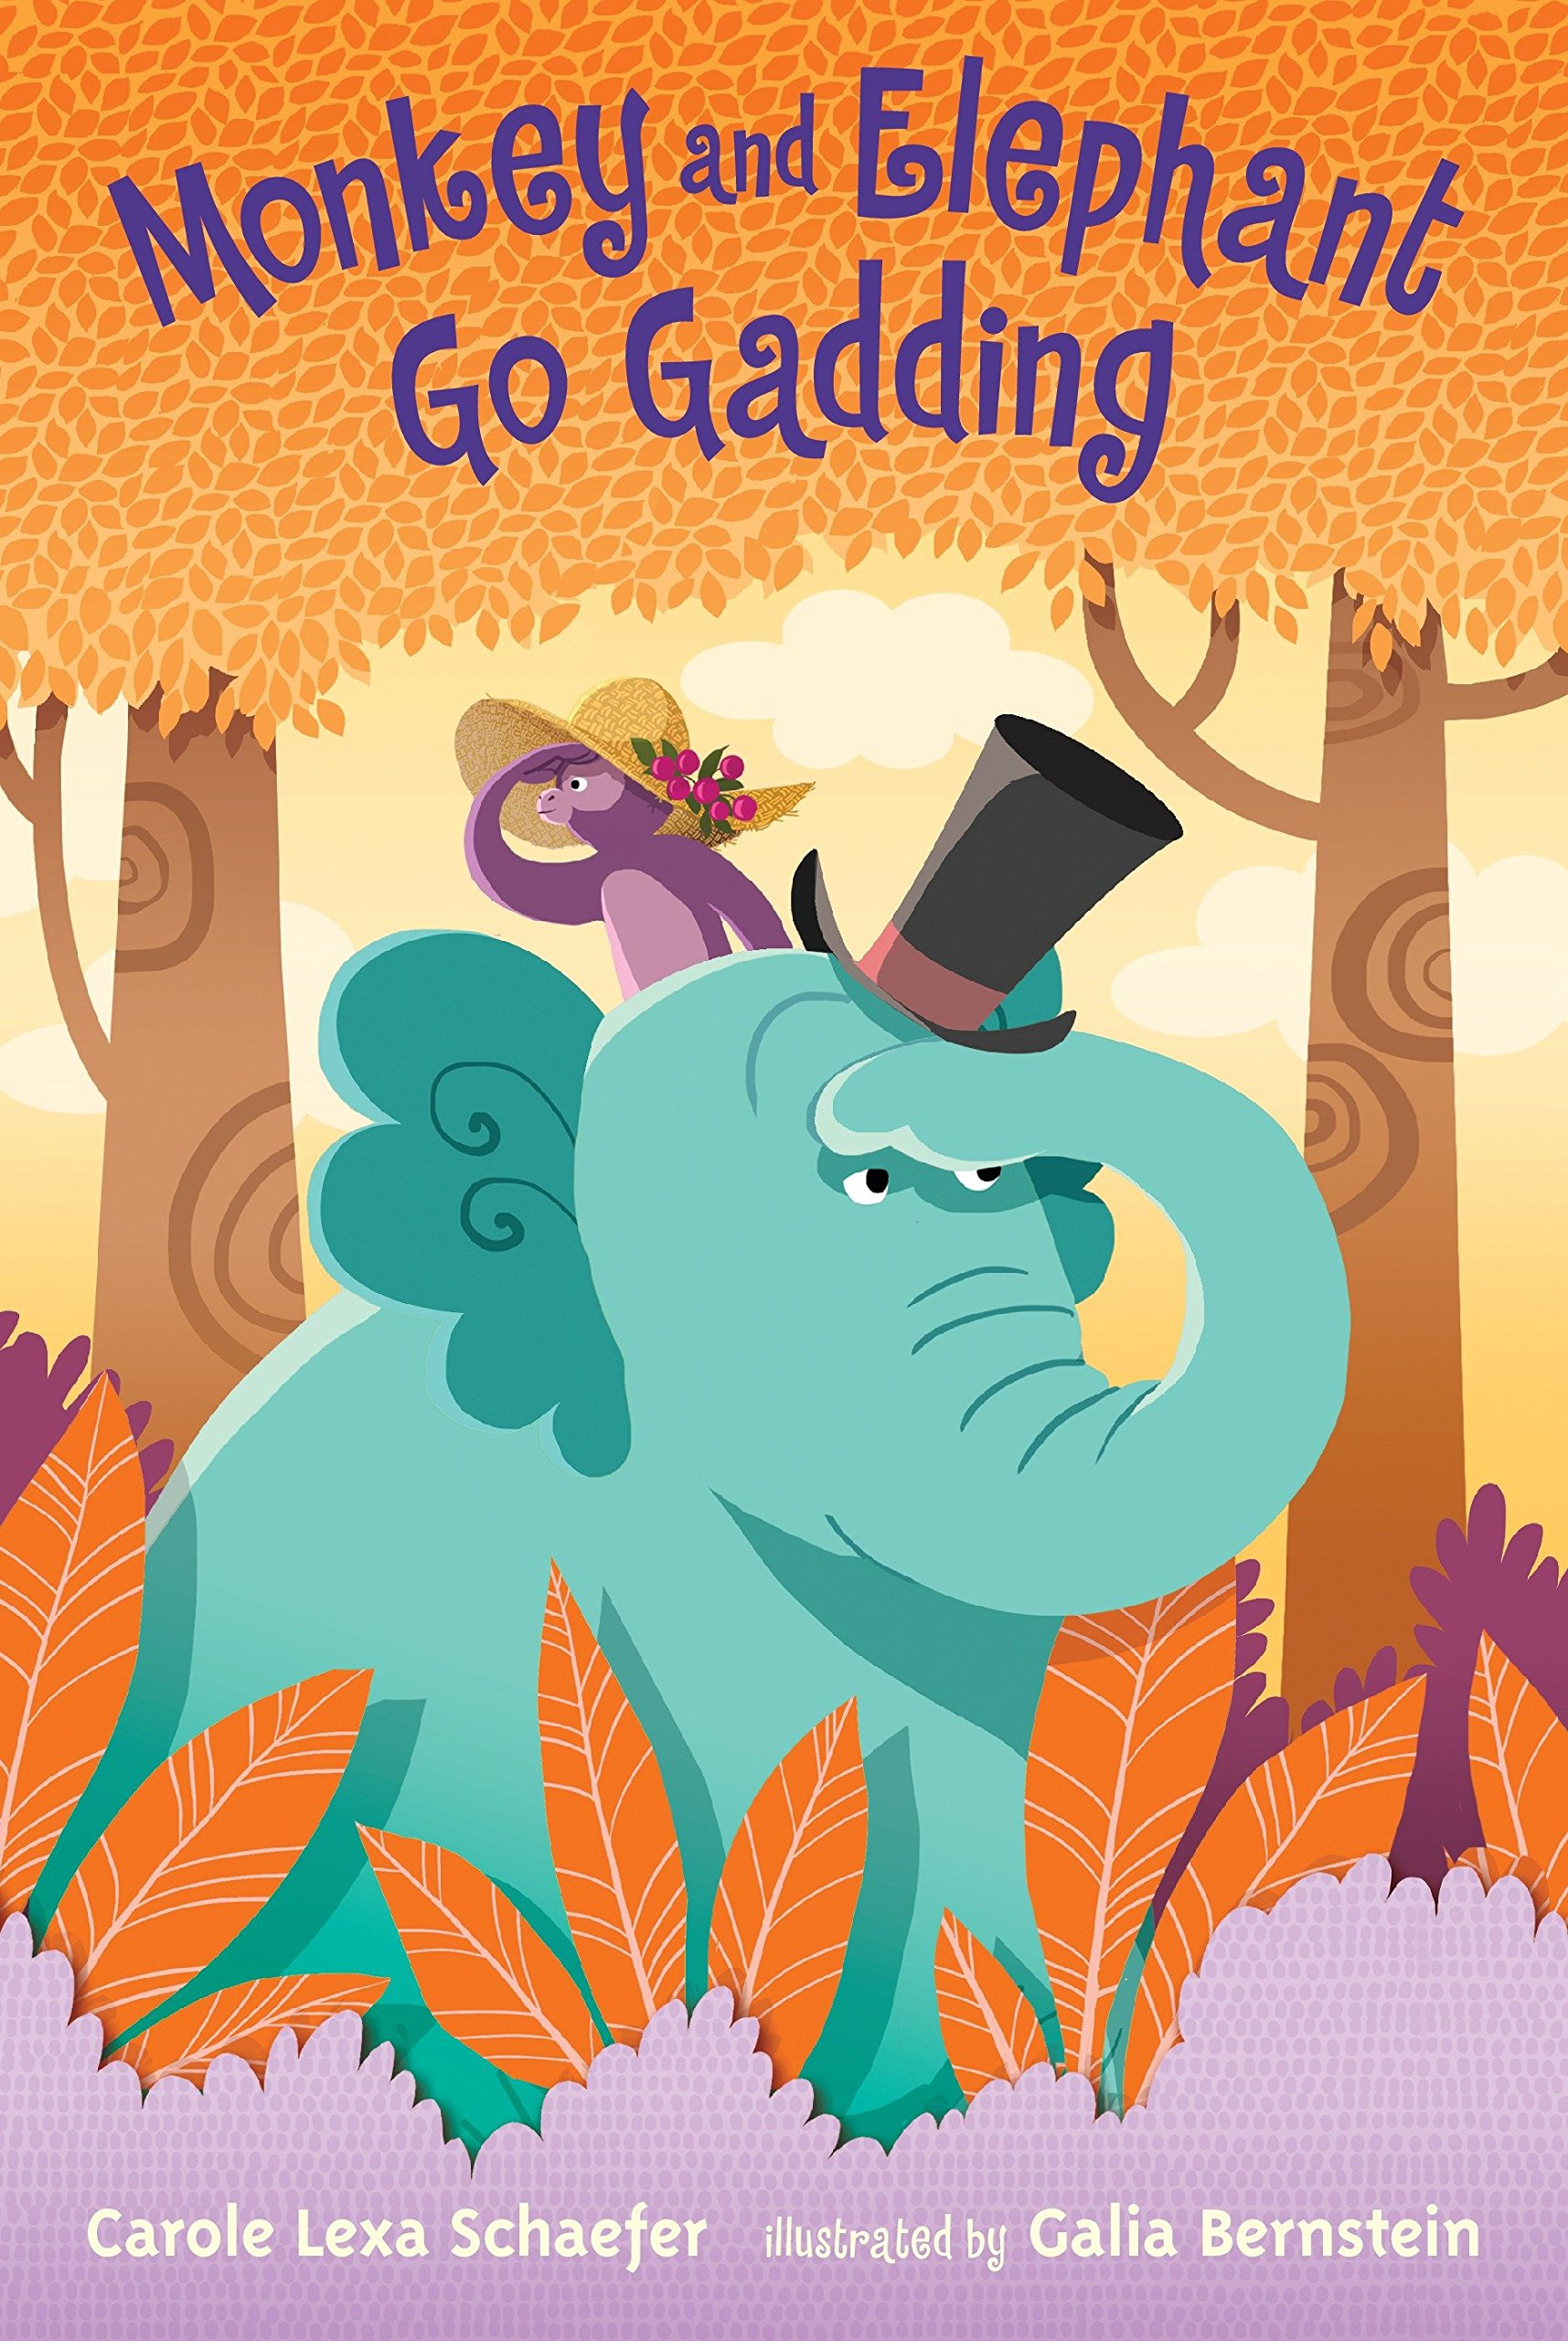 Read Online Monkey and Elephant Go Gadding PDF